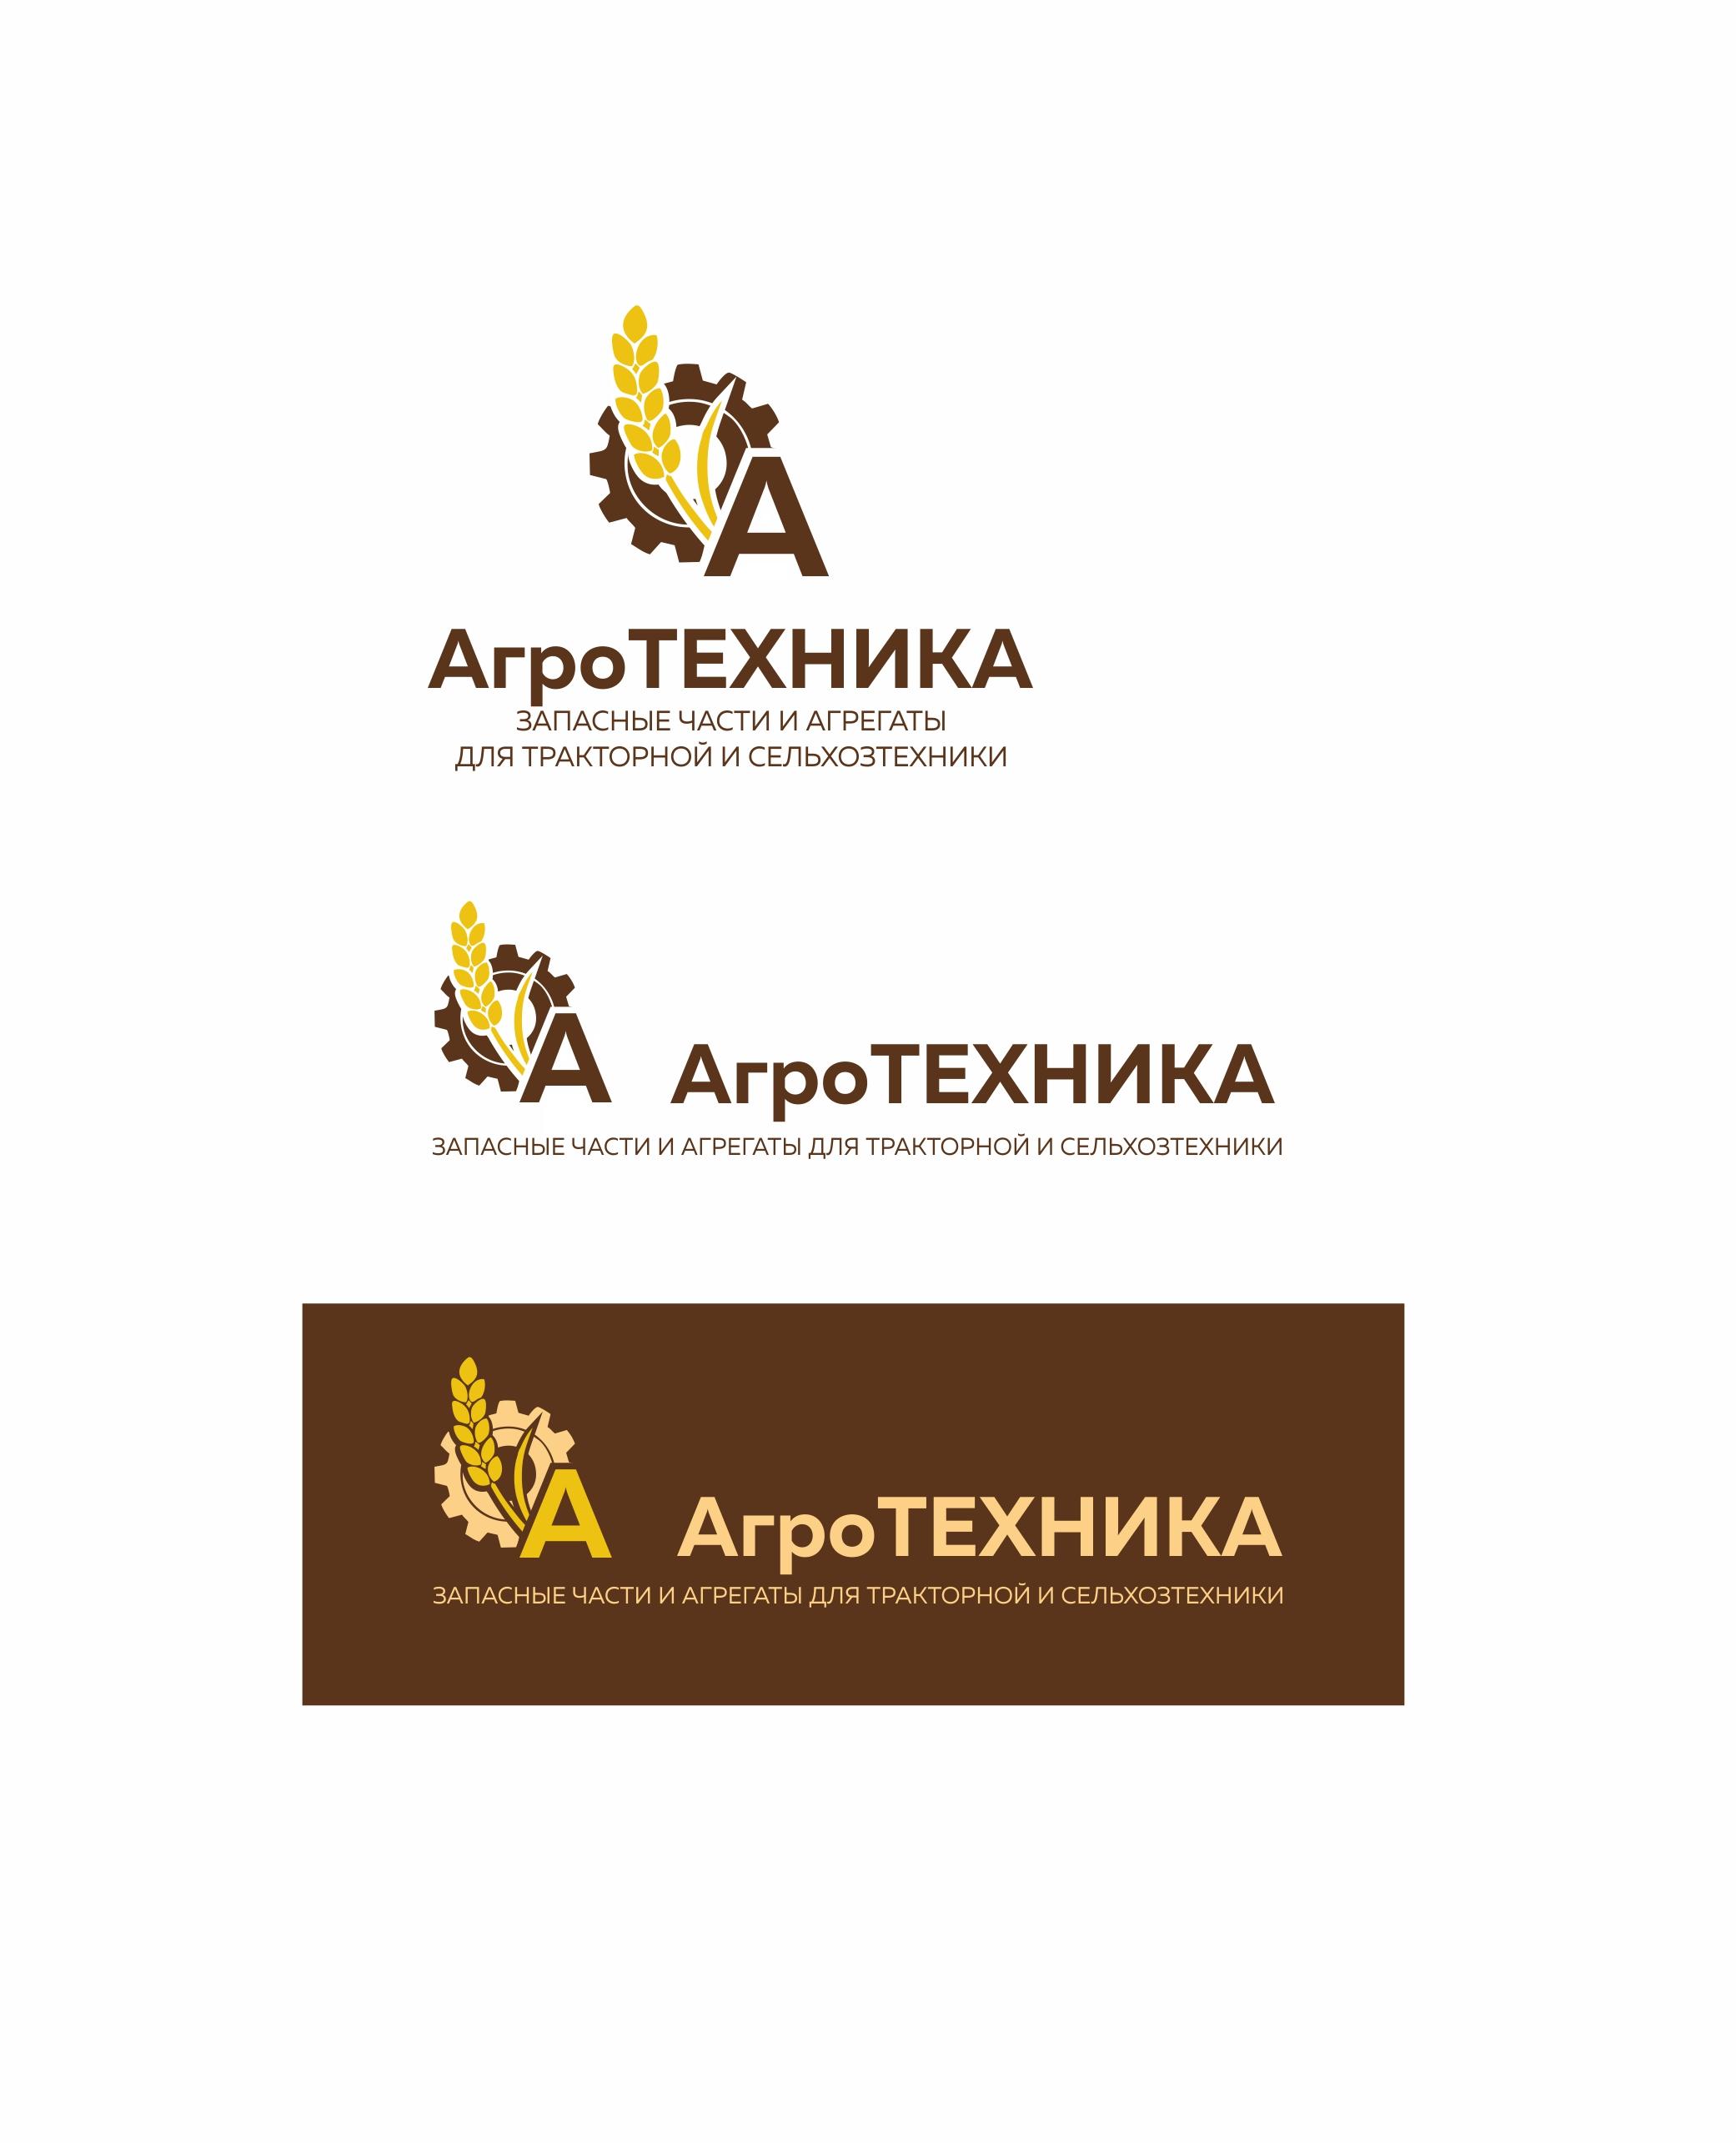 Разработка логотипа для компании Агротехника фото f_9725c04c1bc97c66.jpg